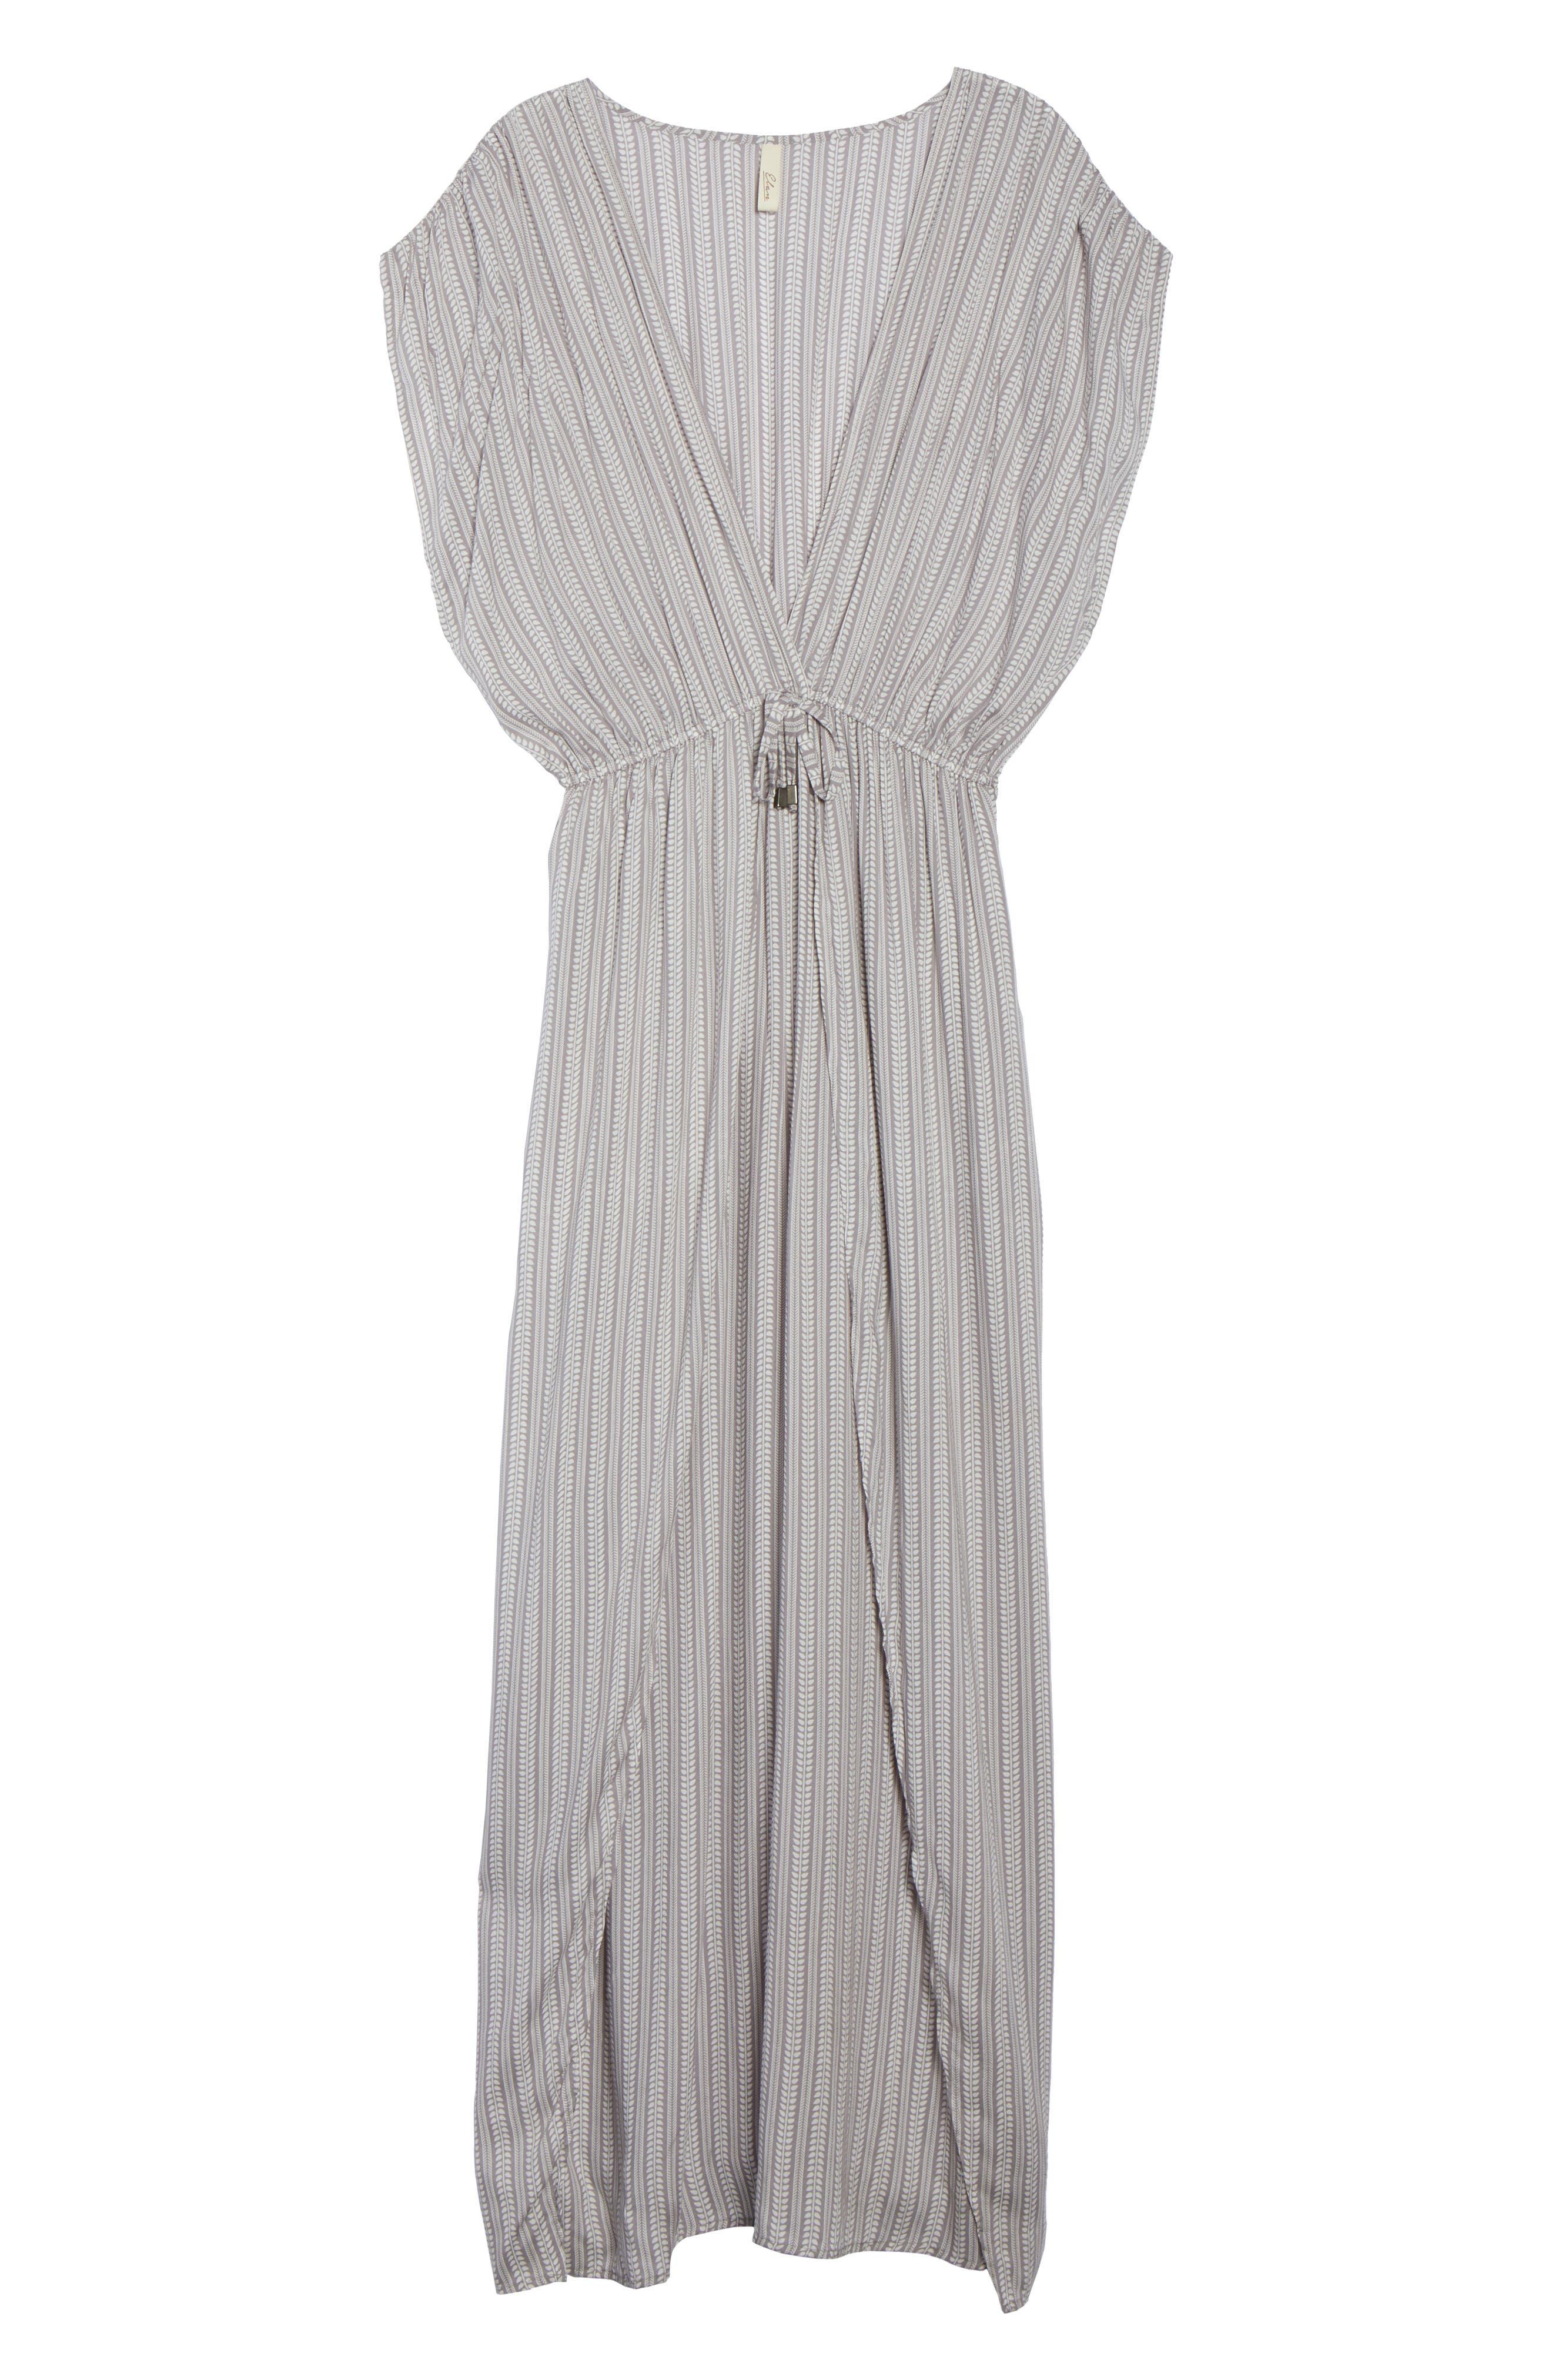 Wrap Maxi Cover-Up Dress,                             Alternate thumbnail 11, color,